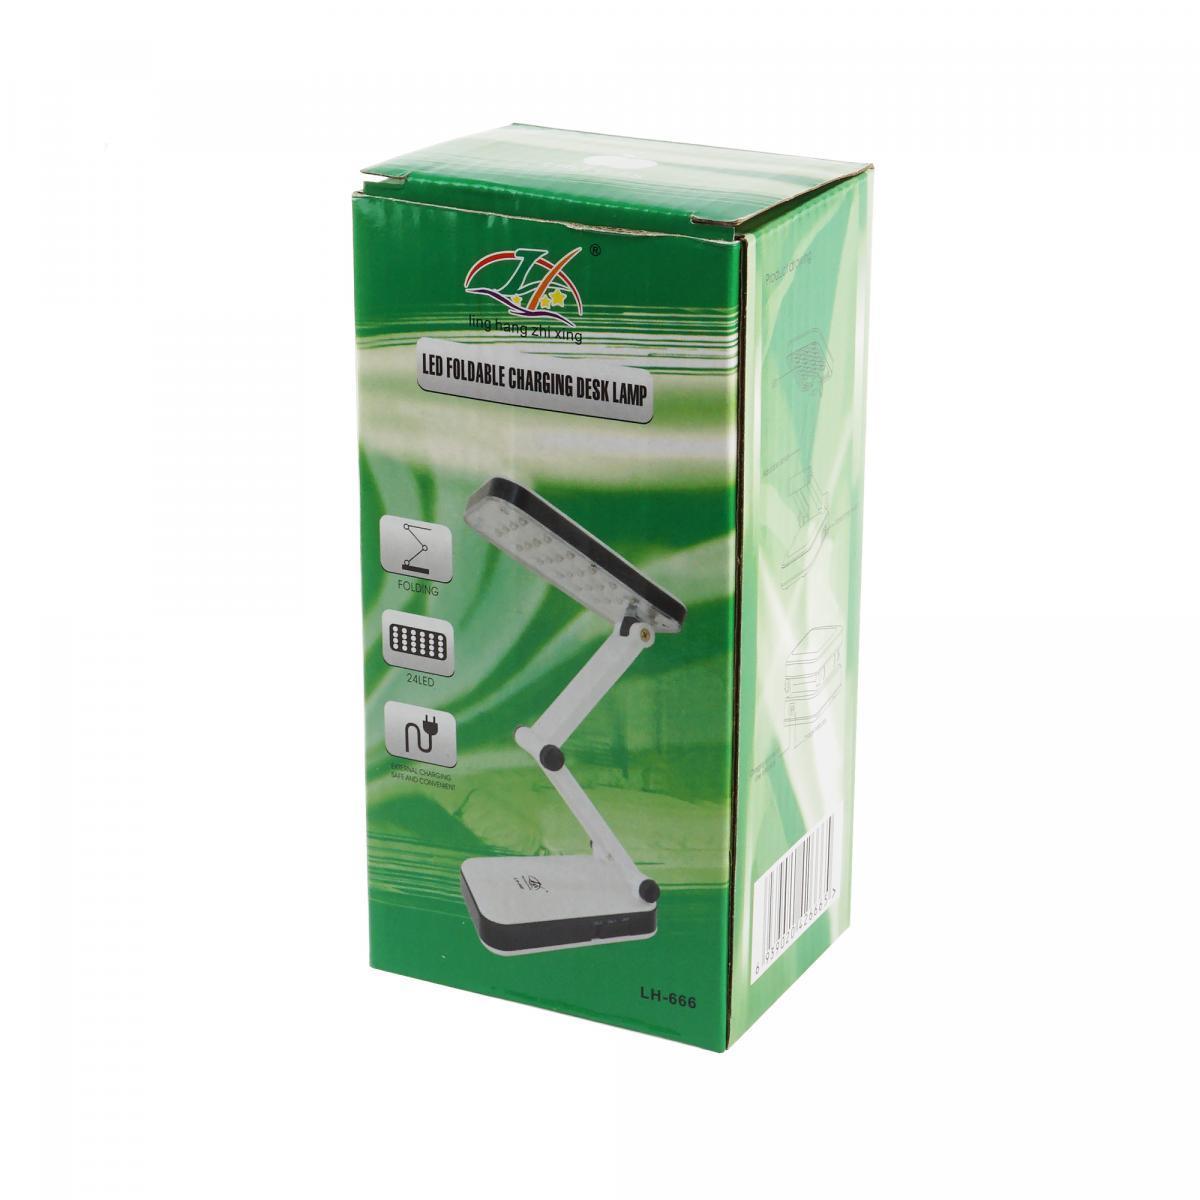 Настольная лампа трансформер 24 LED с аккумулятором - фото 6